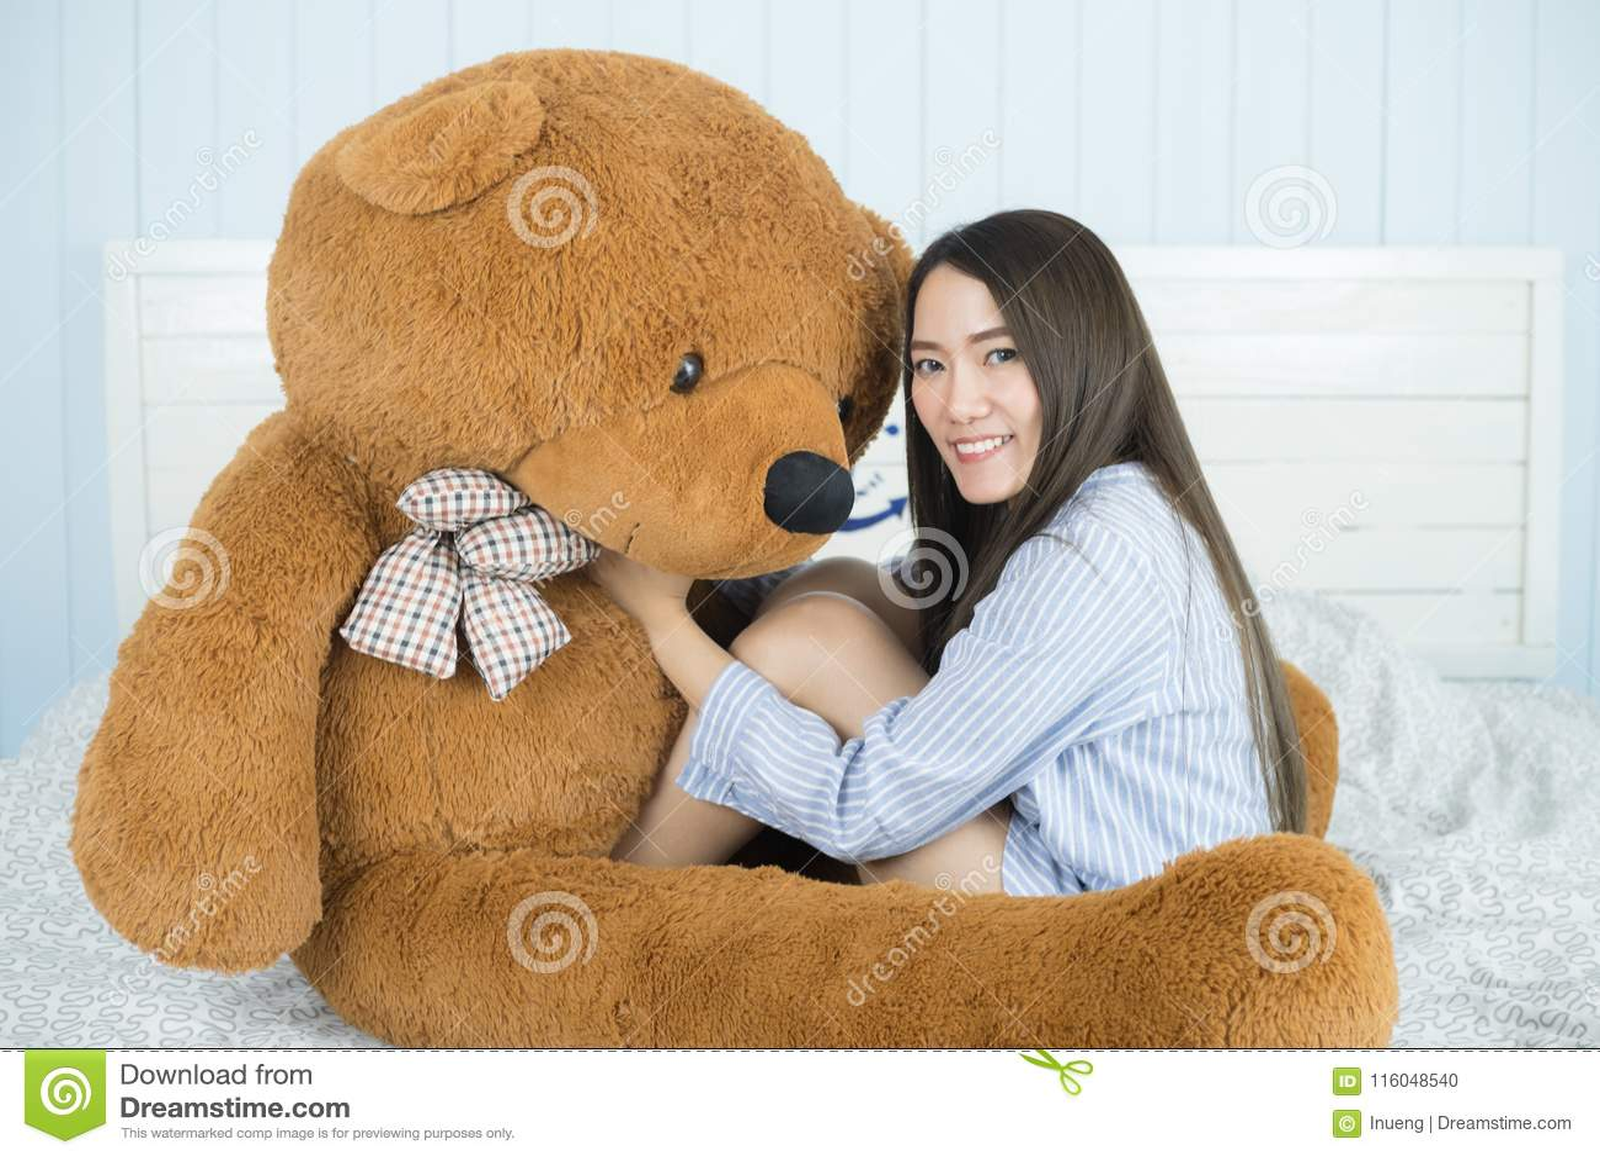 Asian teddy